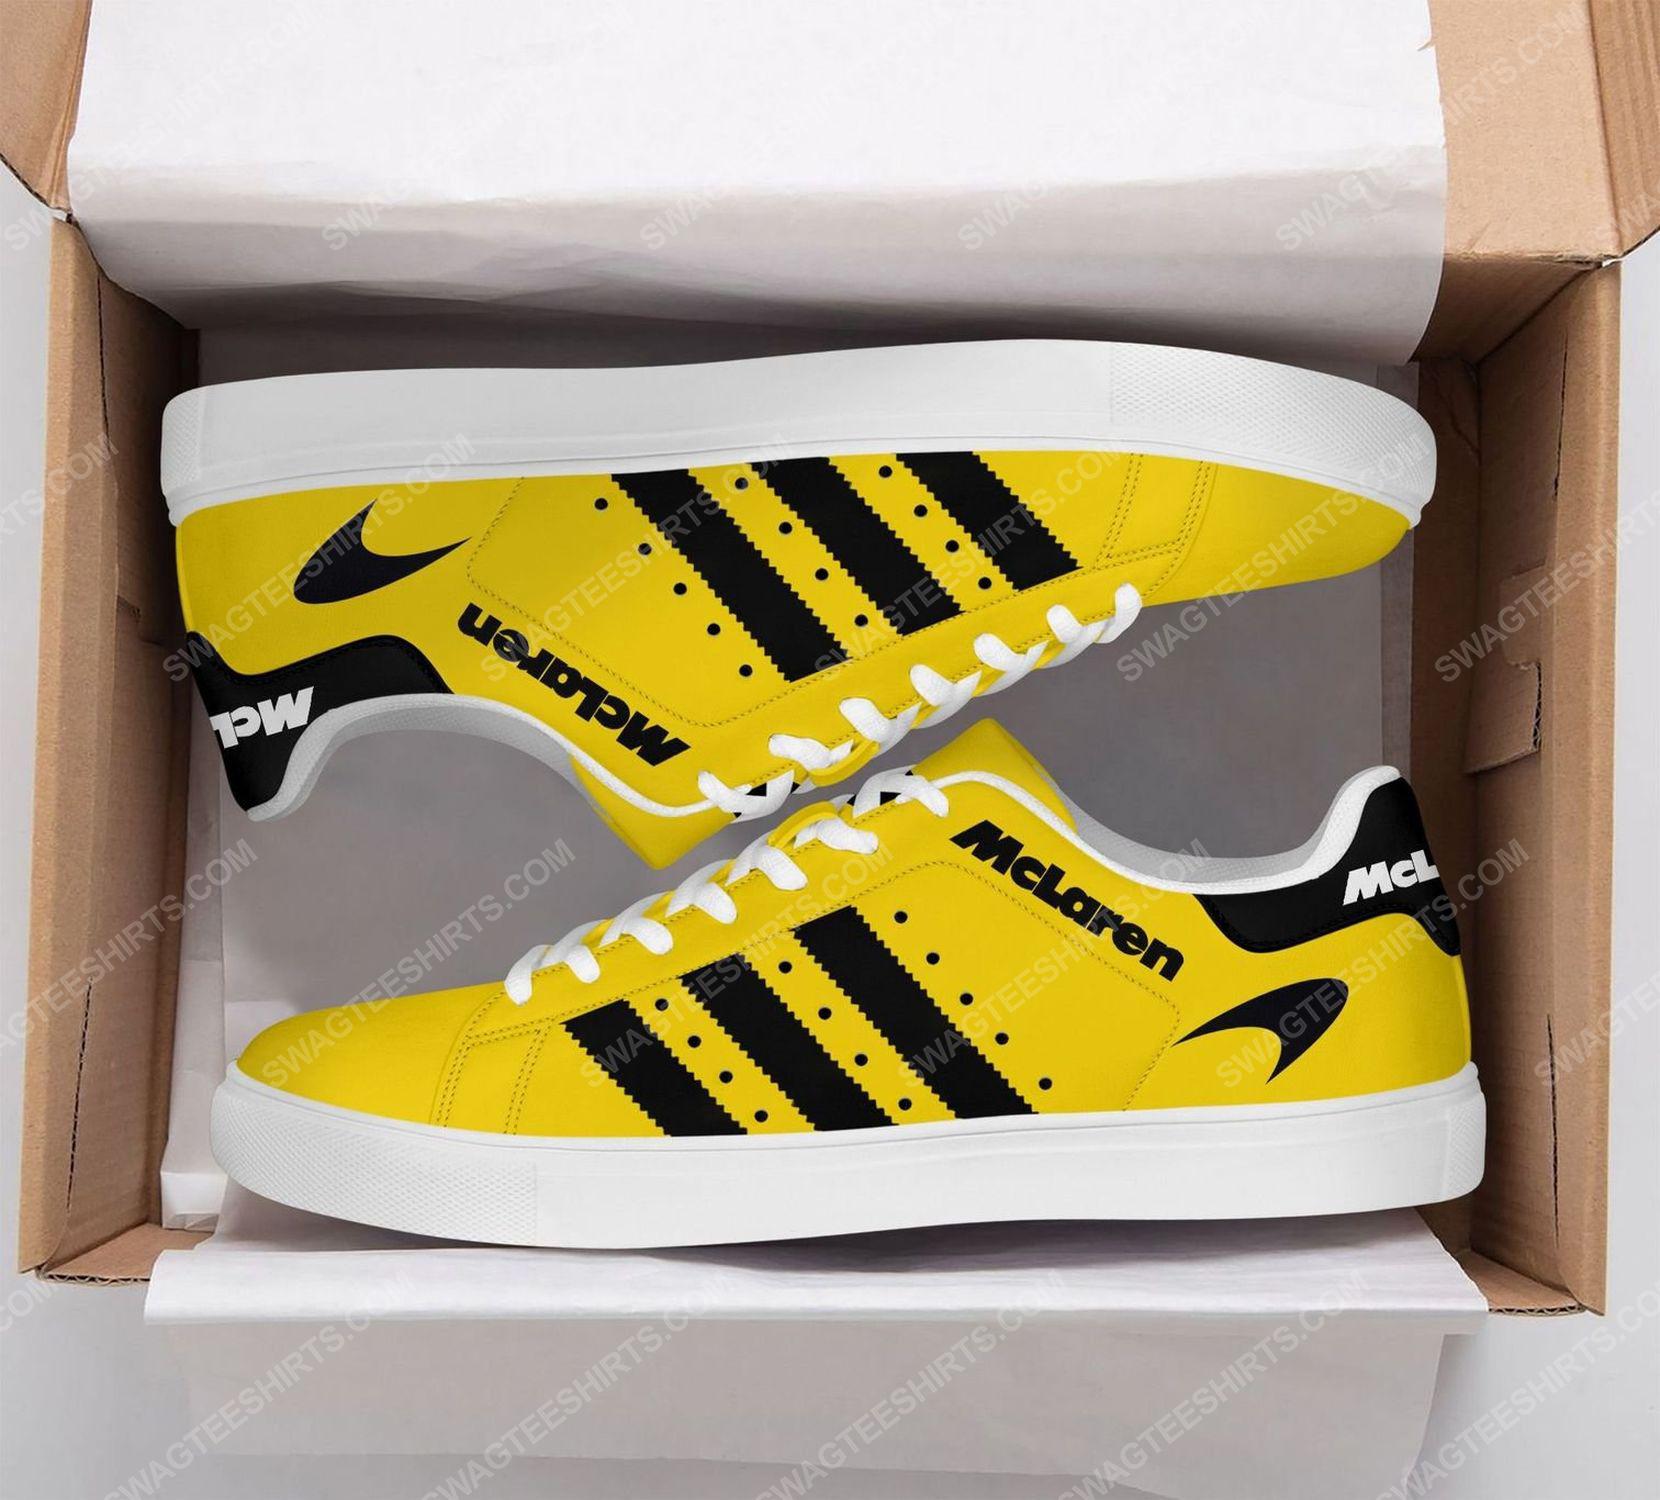 Mclaren automotive racing version yellow stan smith shoes 2